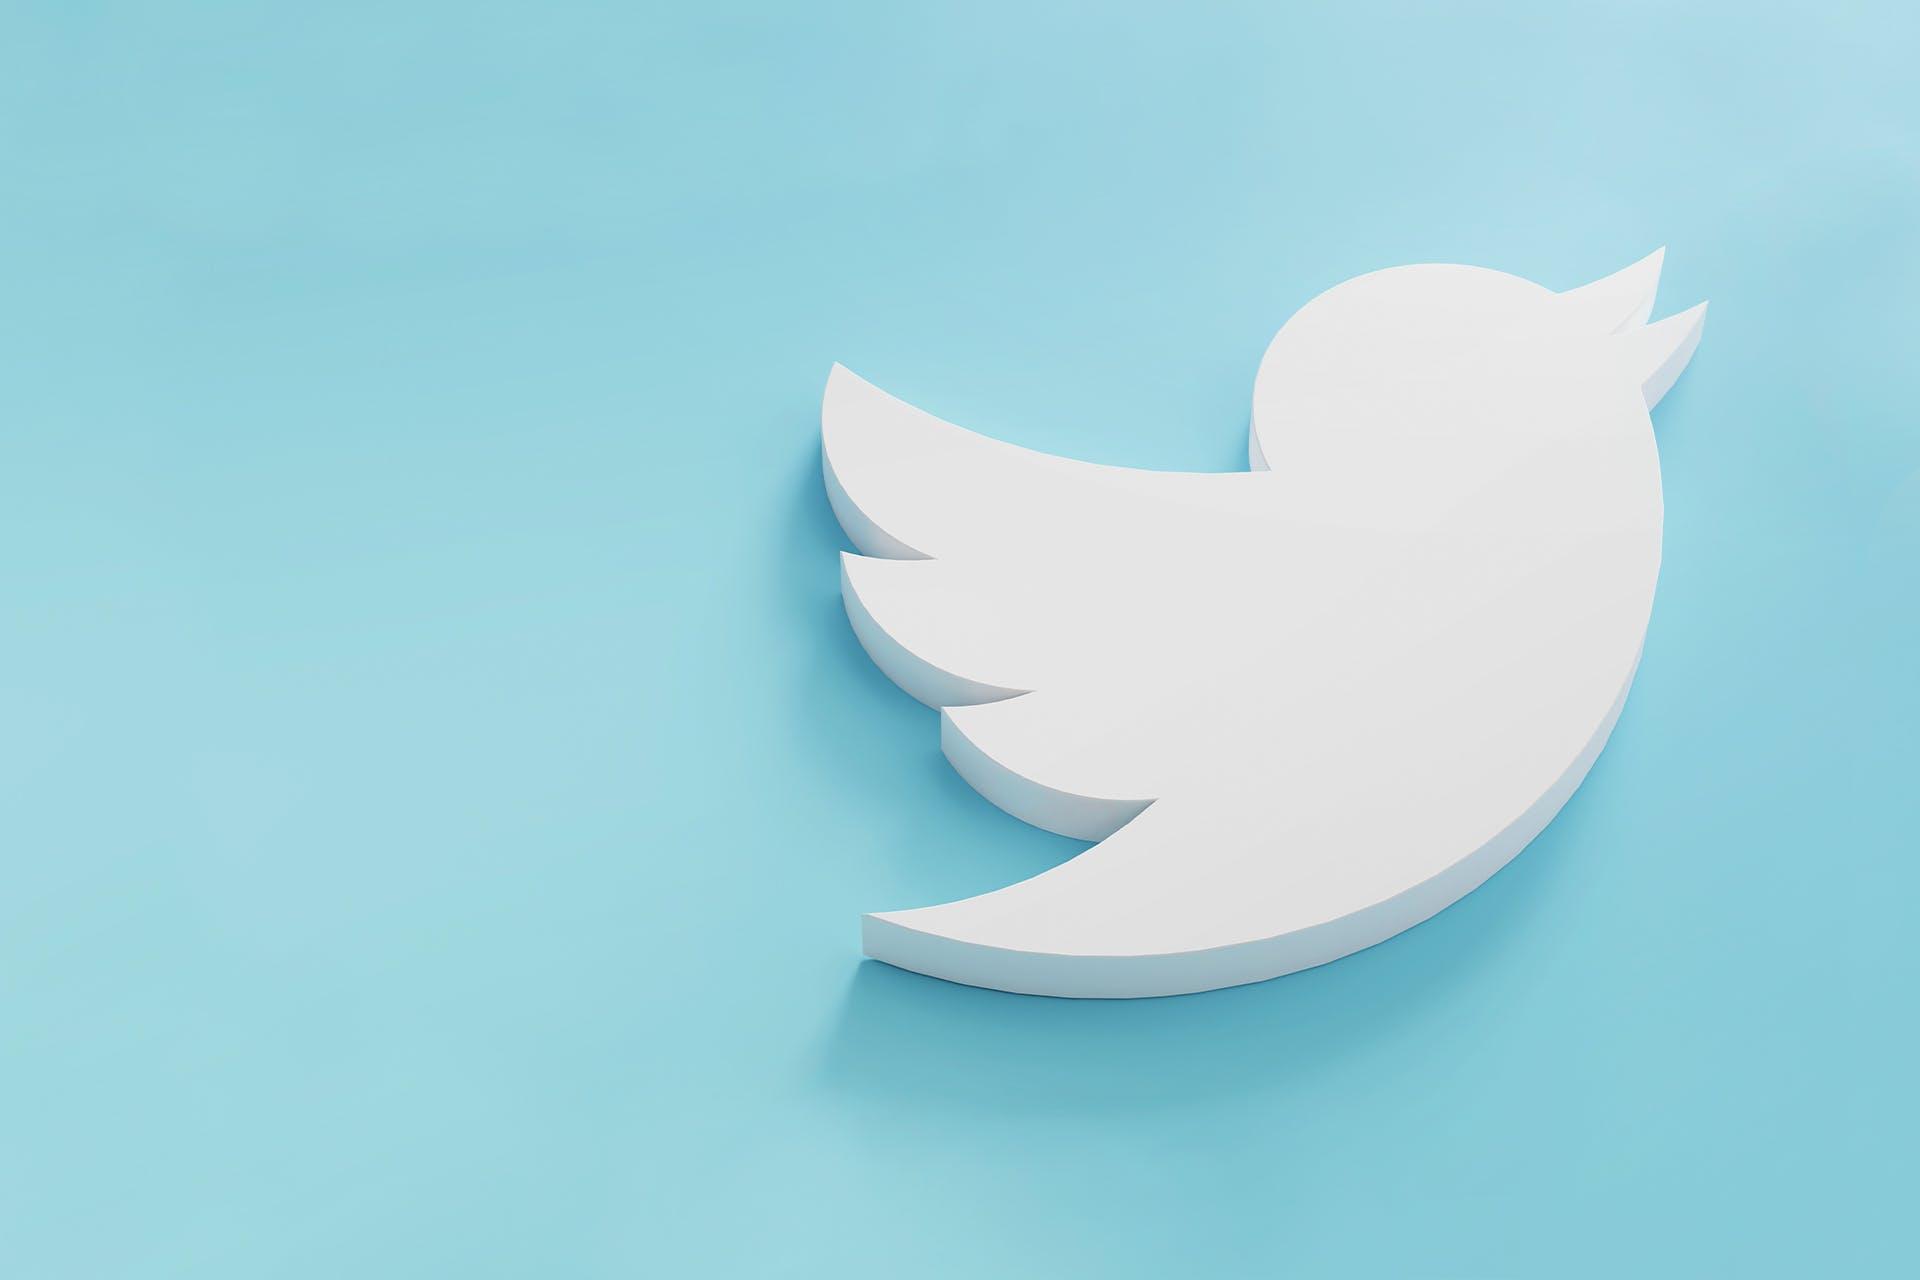 White Twitter bird over light blue background. Twitter marketing strategy blog.